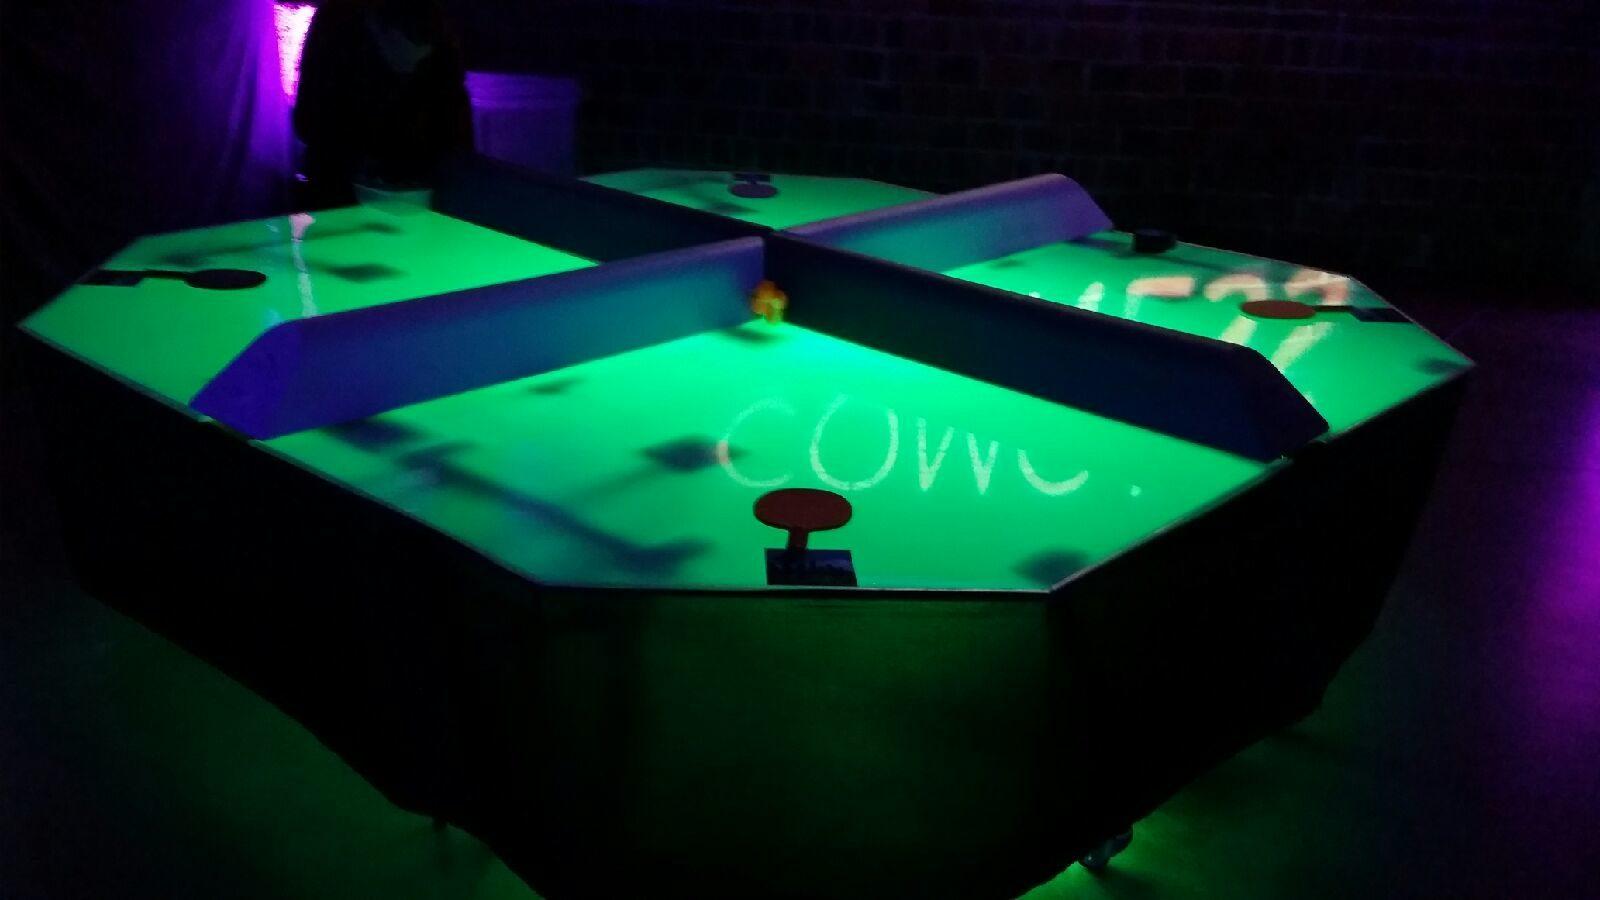 LED Poly Pong